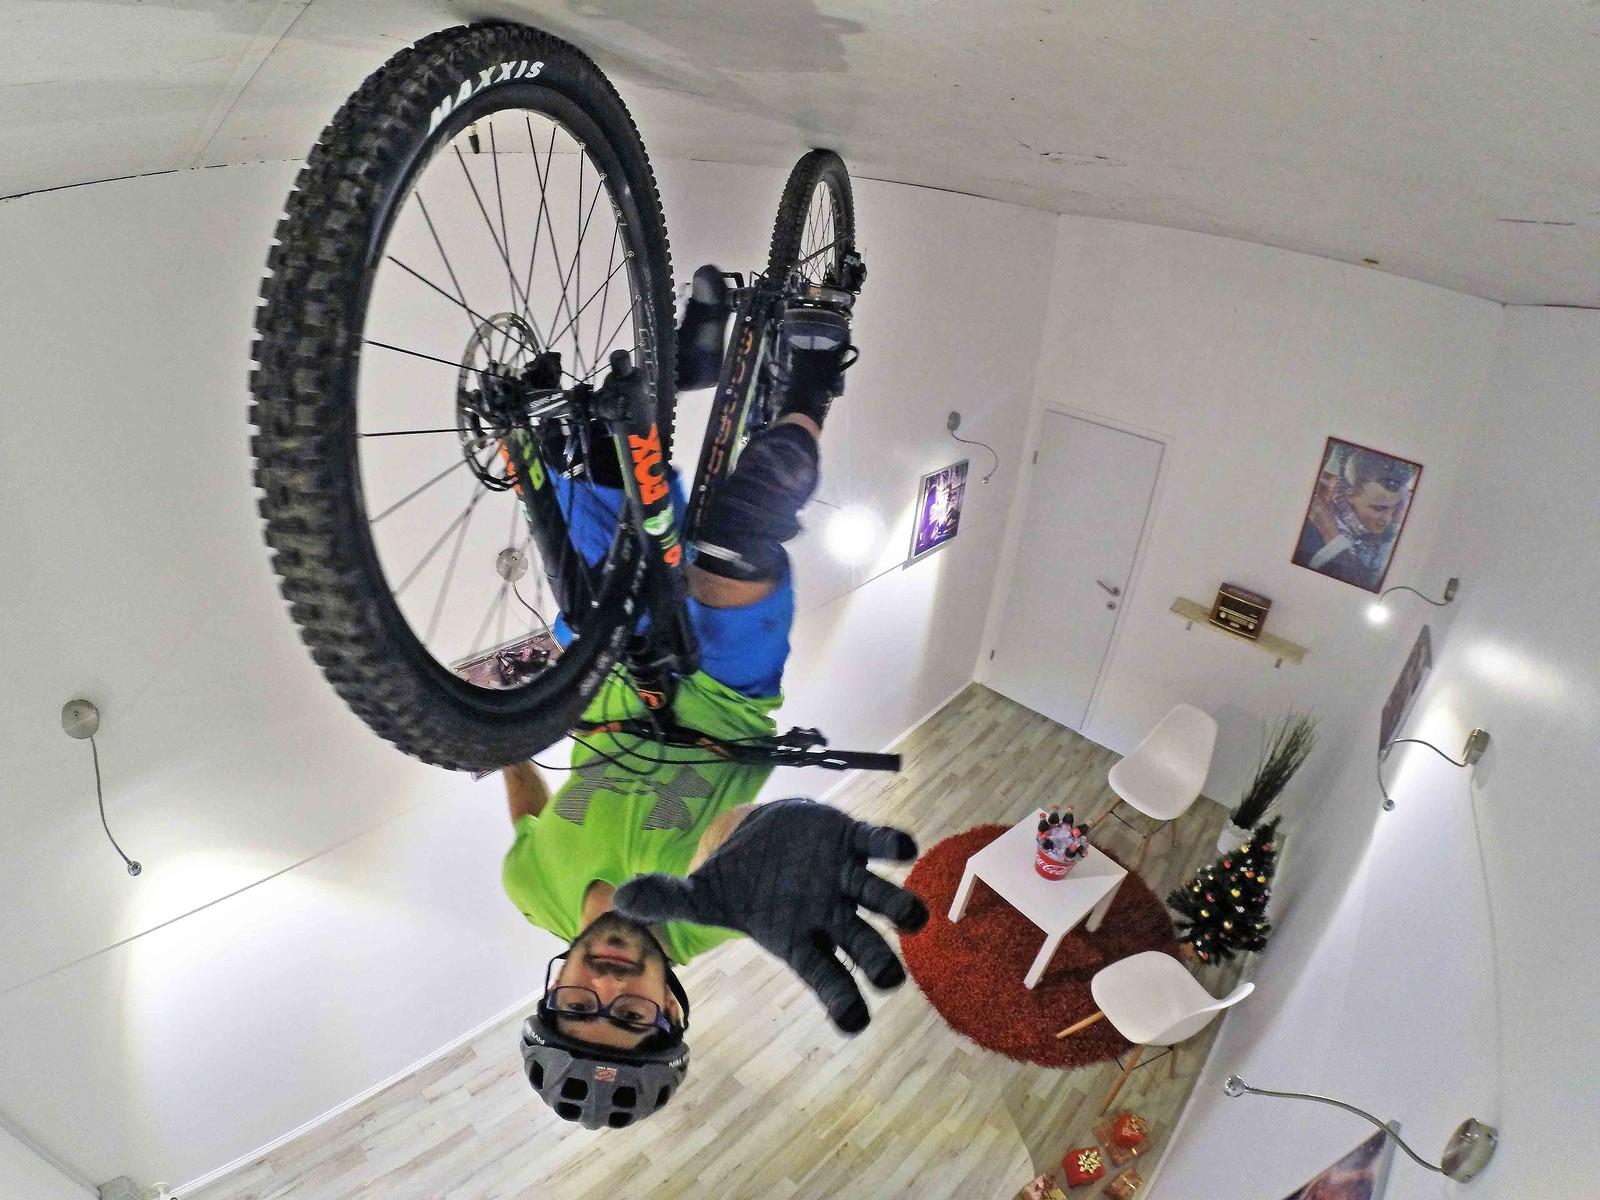 Bike illusion! - porson - Mountain Biking Pictures - Vital MTB